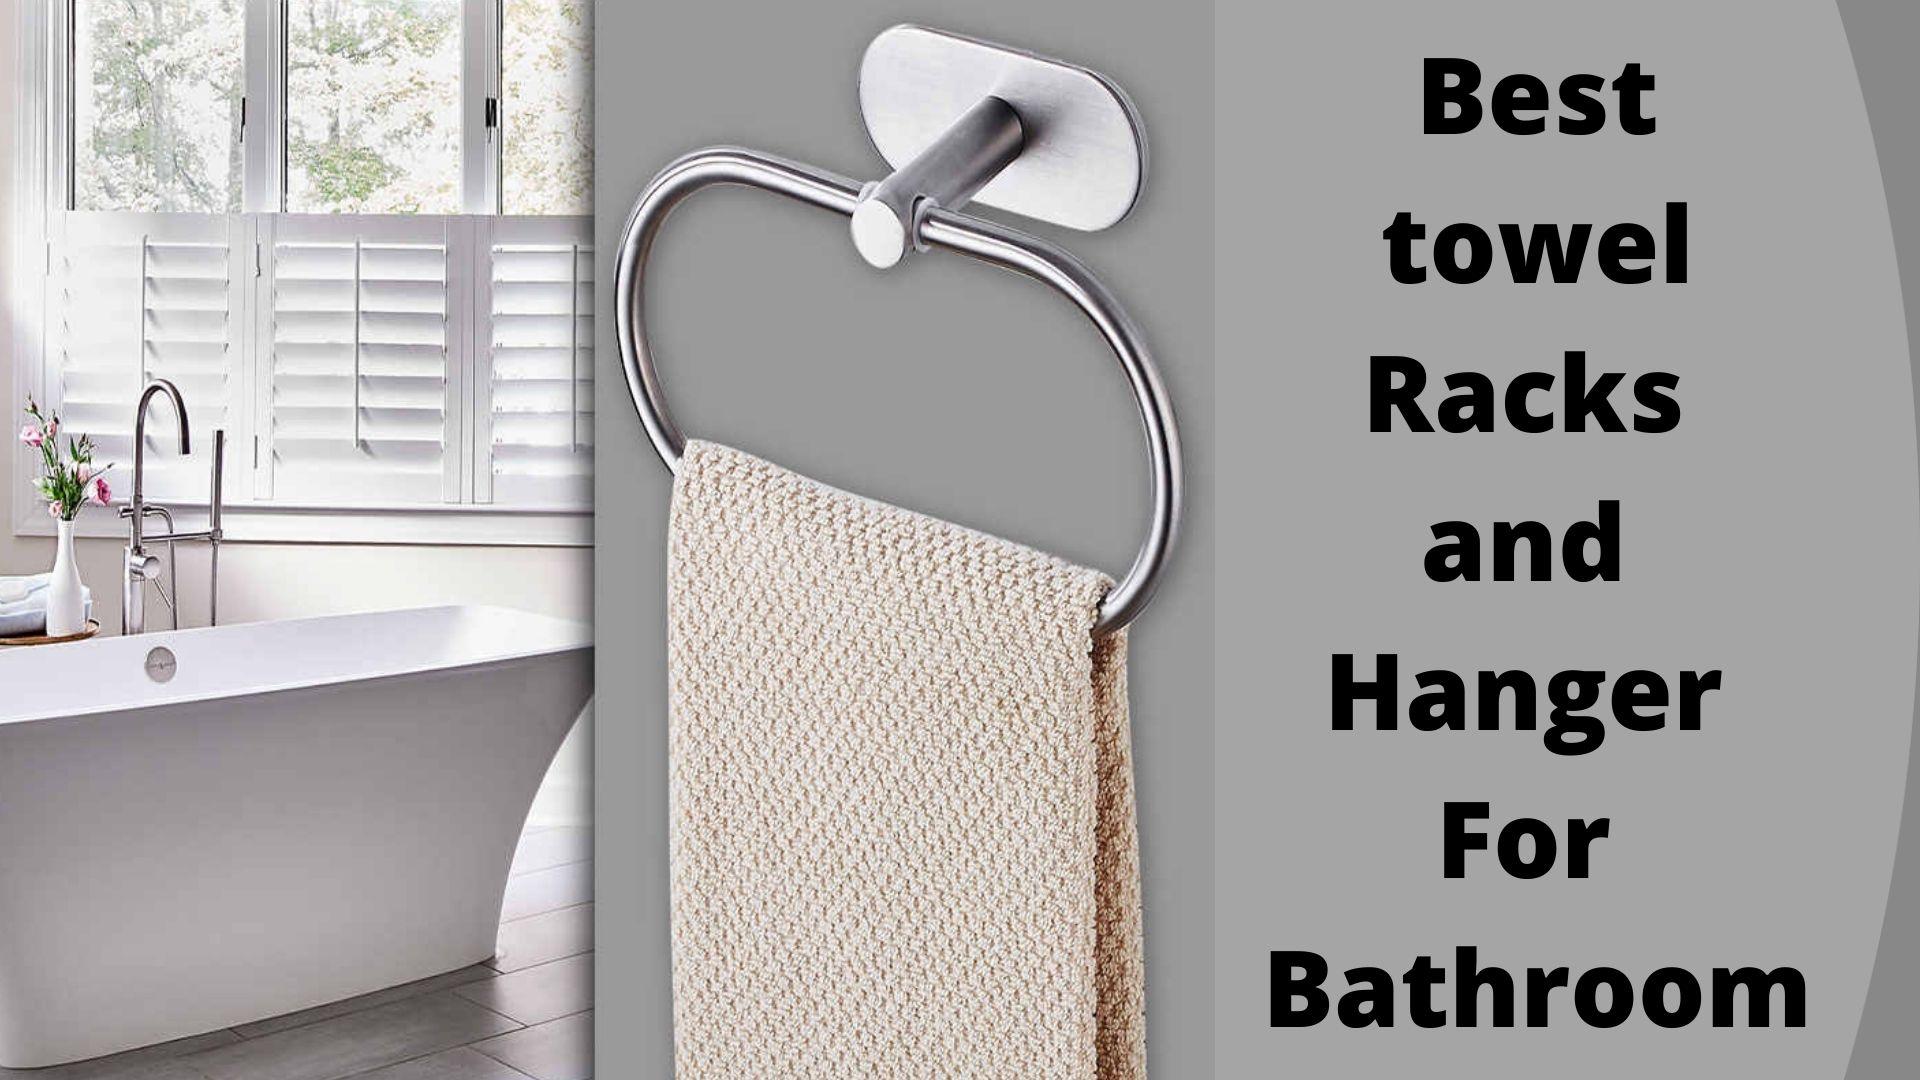 Best towel Racks and Hanger For Bathroom